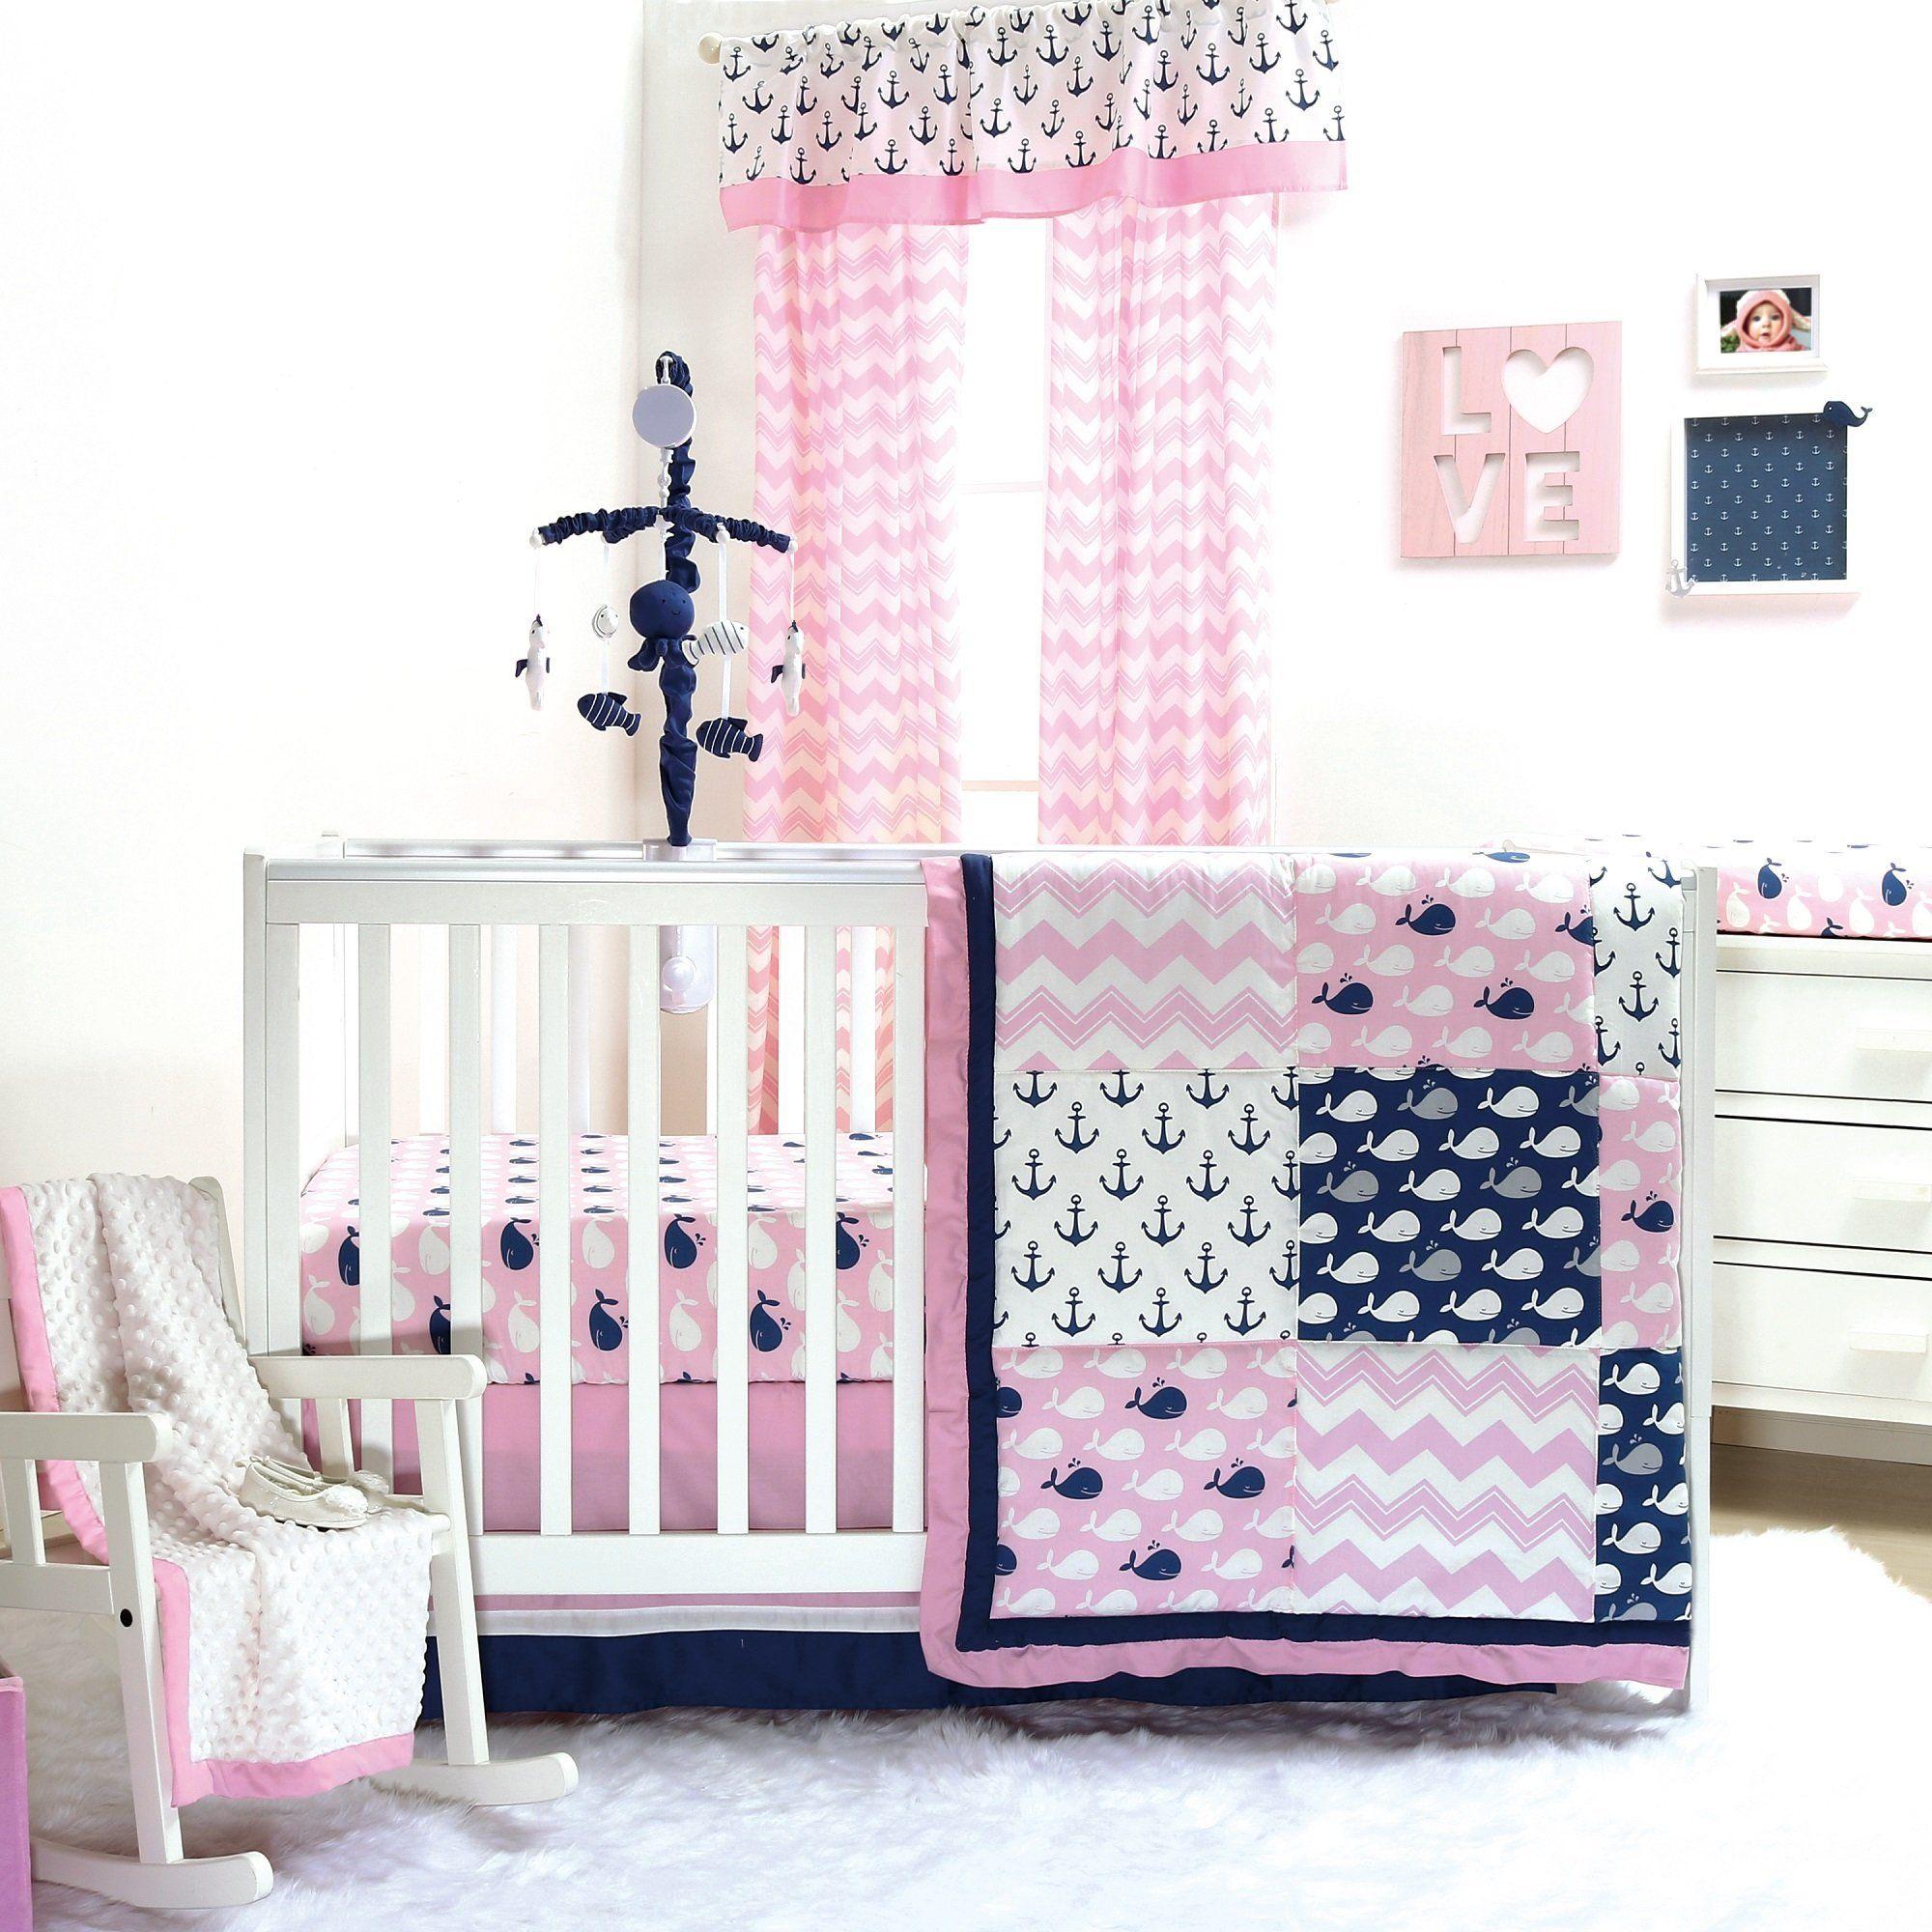 The Peanutshell Pink Whale Crib Bedding Set Crib Bedding Girl